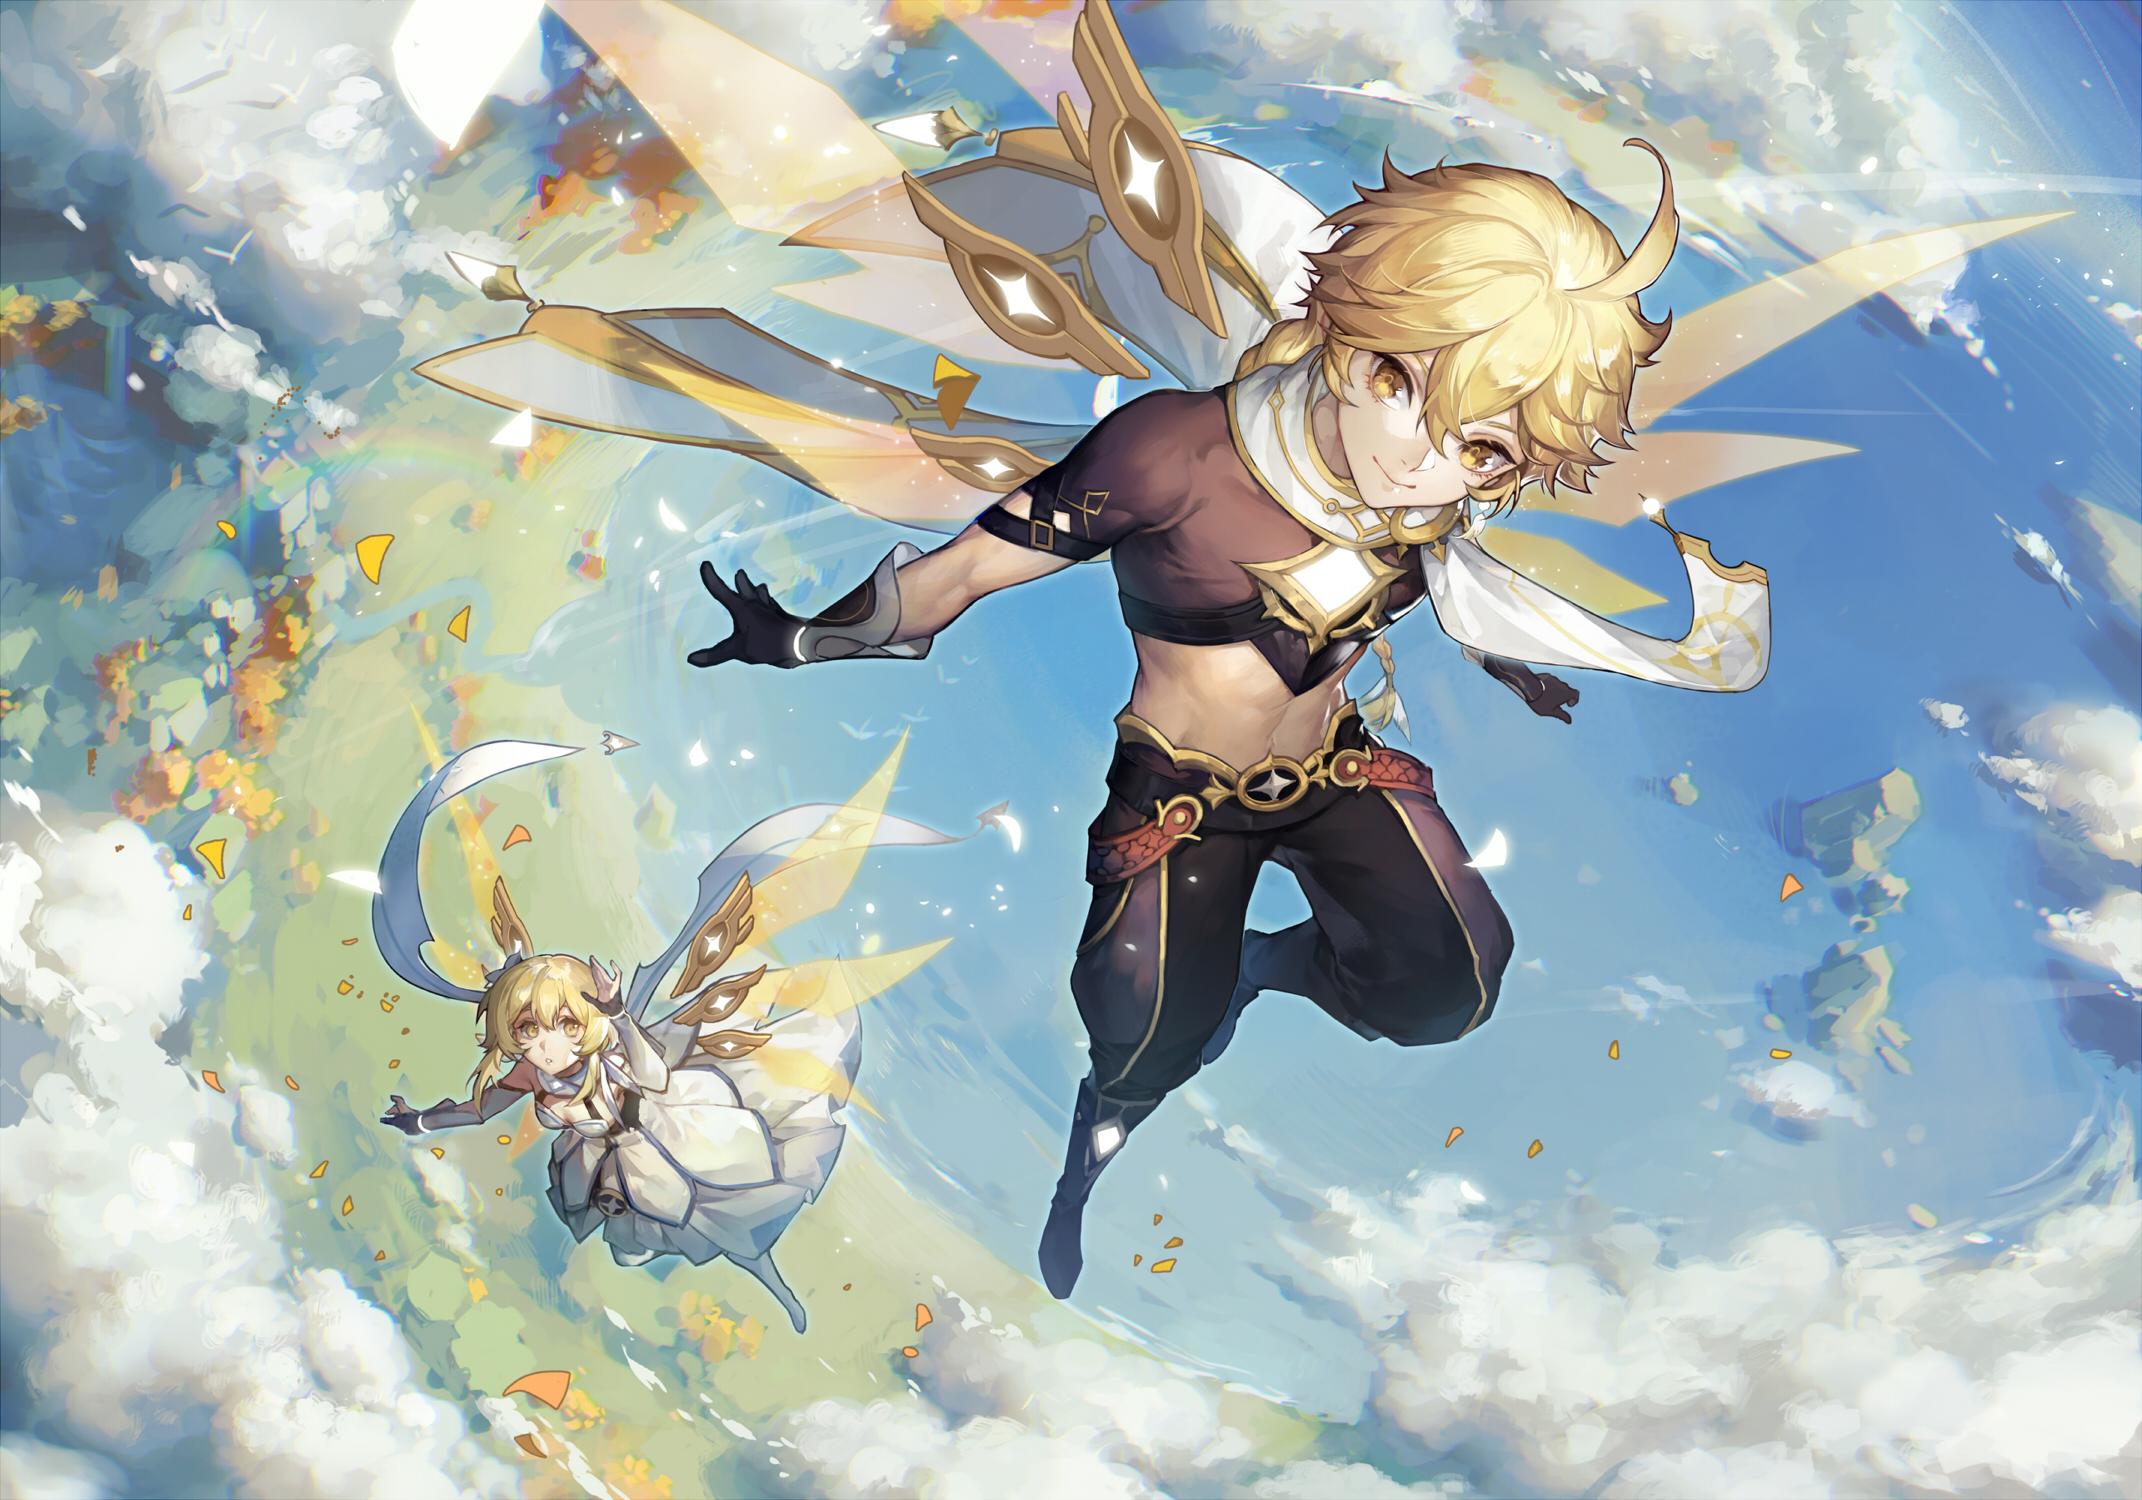 Genshin Impact Hd Wallpaper Background Image 2142x1500 Id 1109239 Wallpaper Abyss